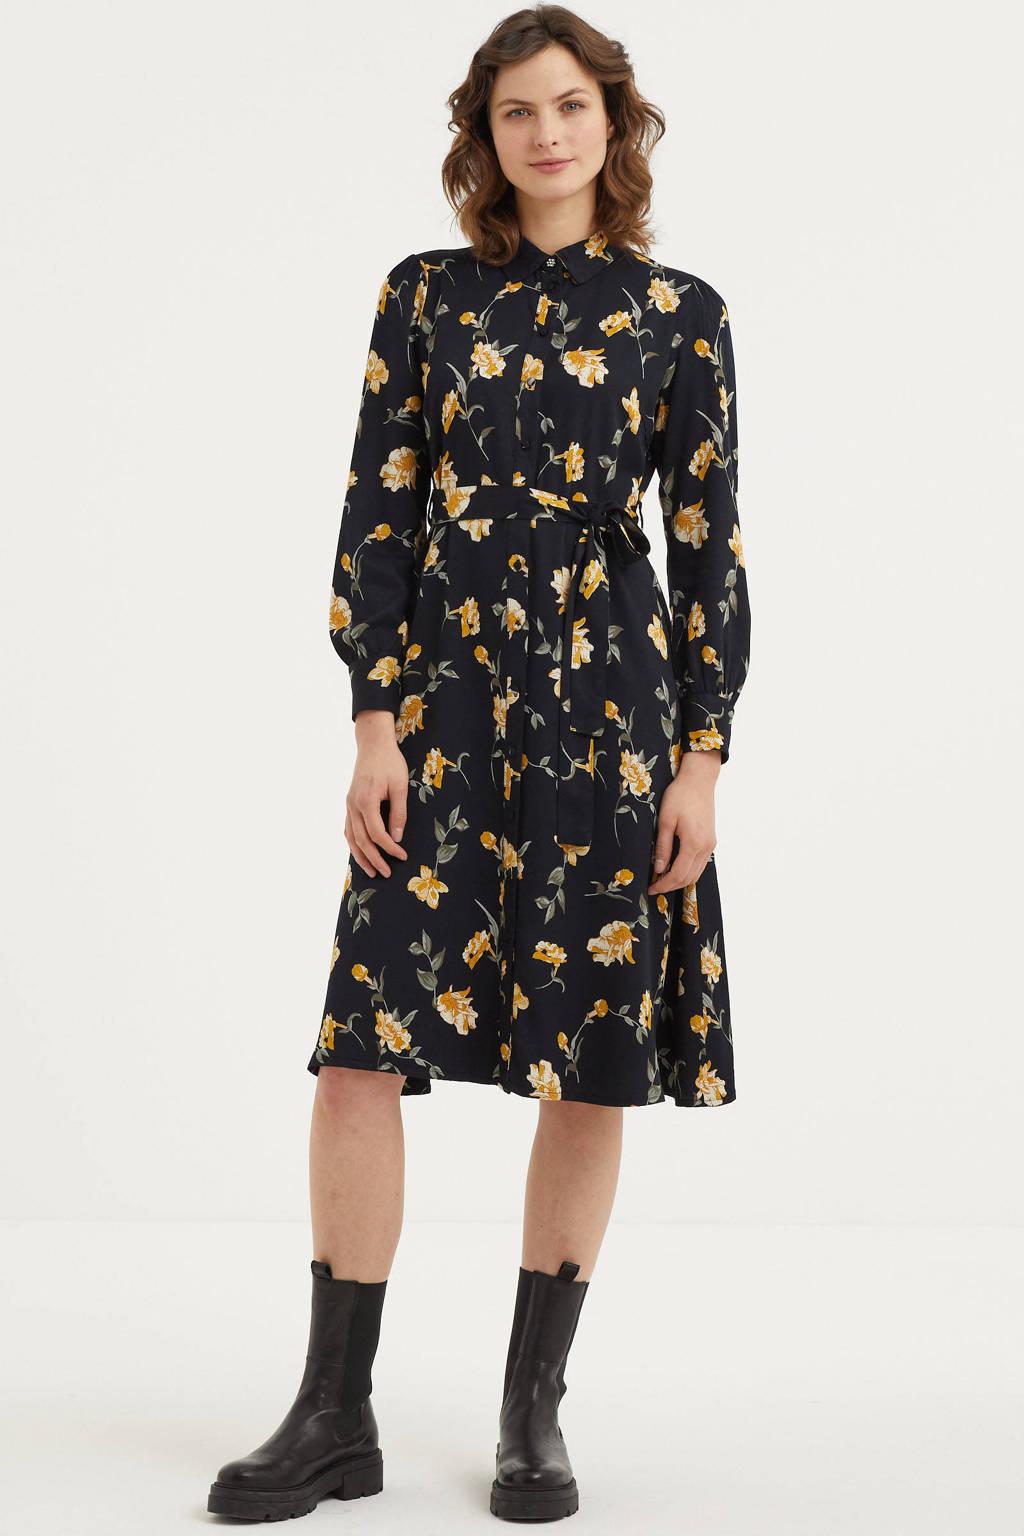 PIECES blousejurk met all over print zwart, Zwart